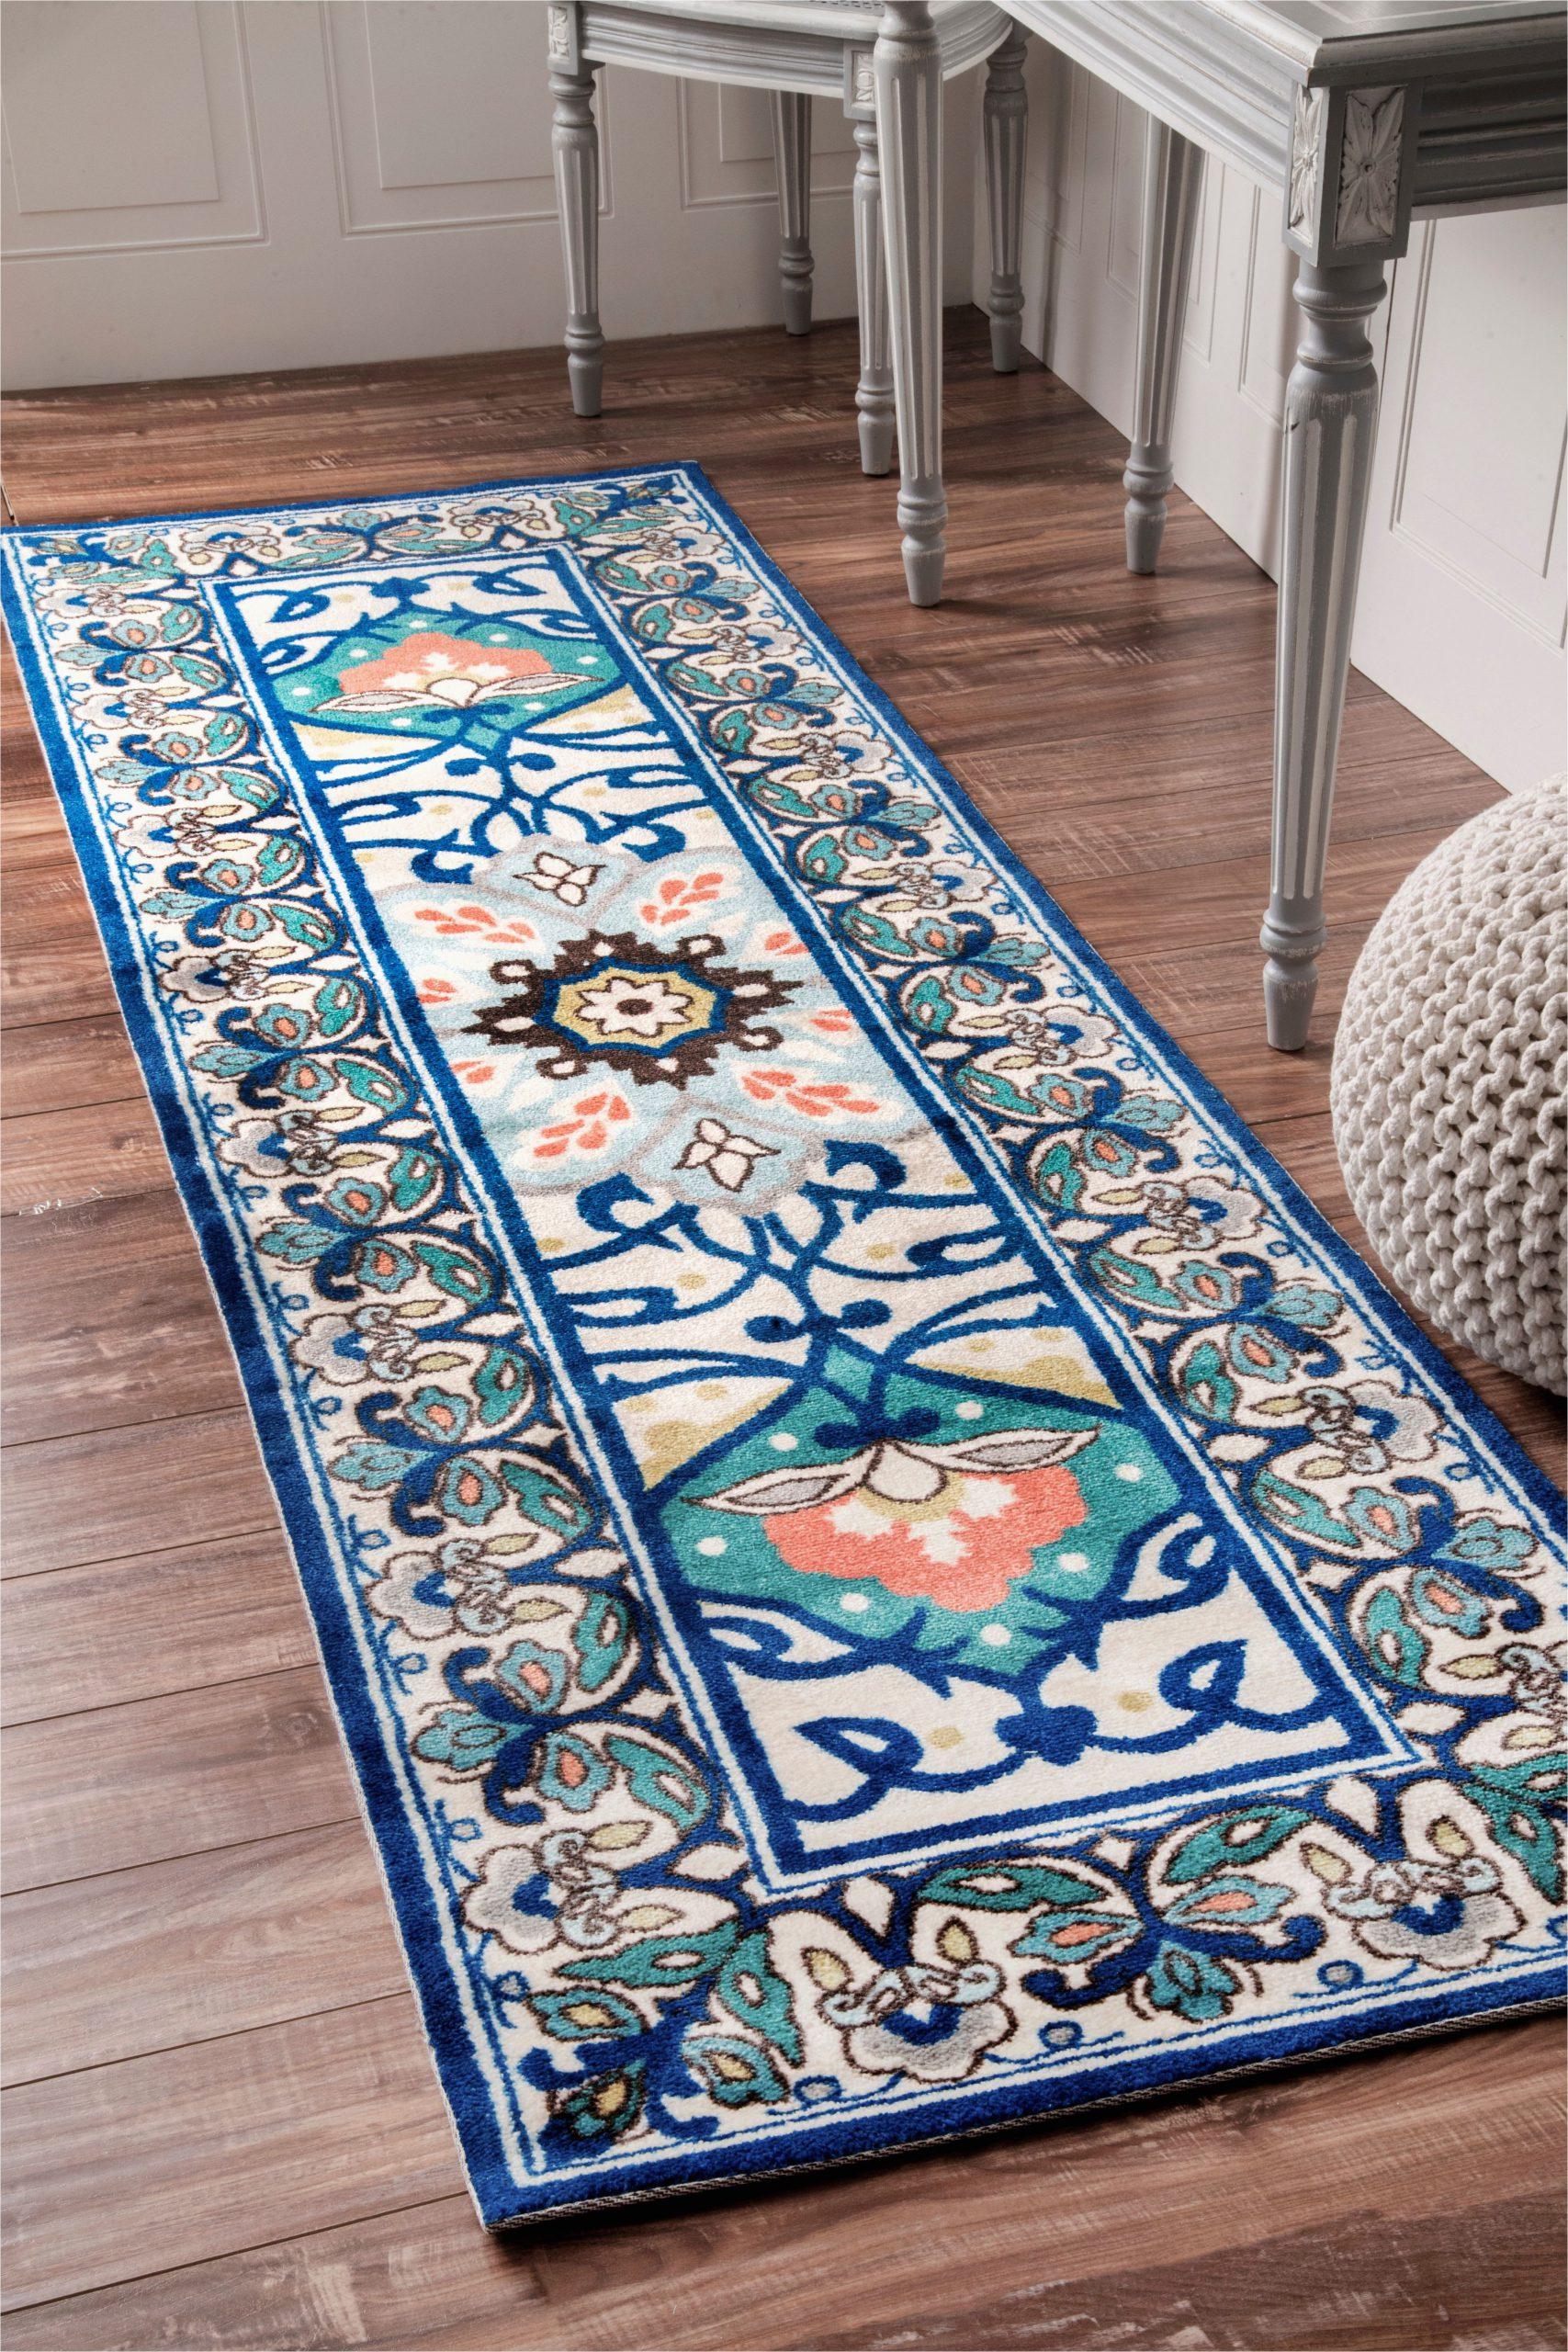 Kujawa Blue area Rug Flourish Jewel tone Floral Printed Blue Rug